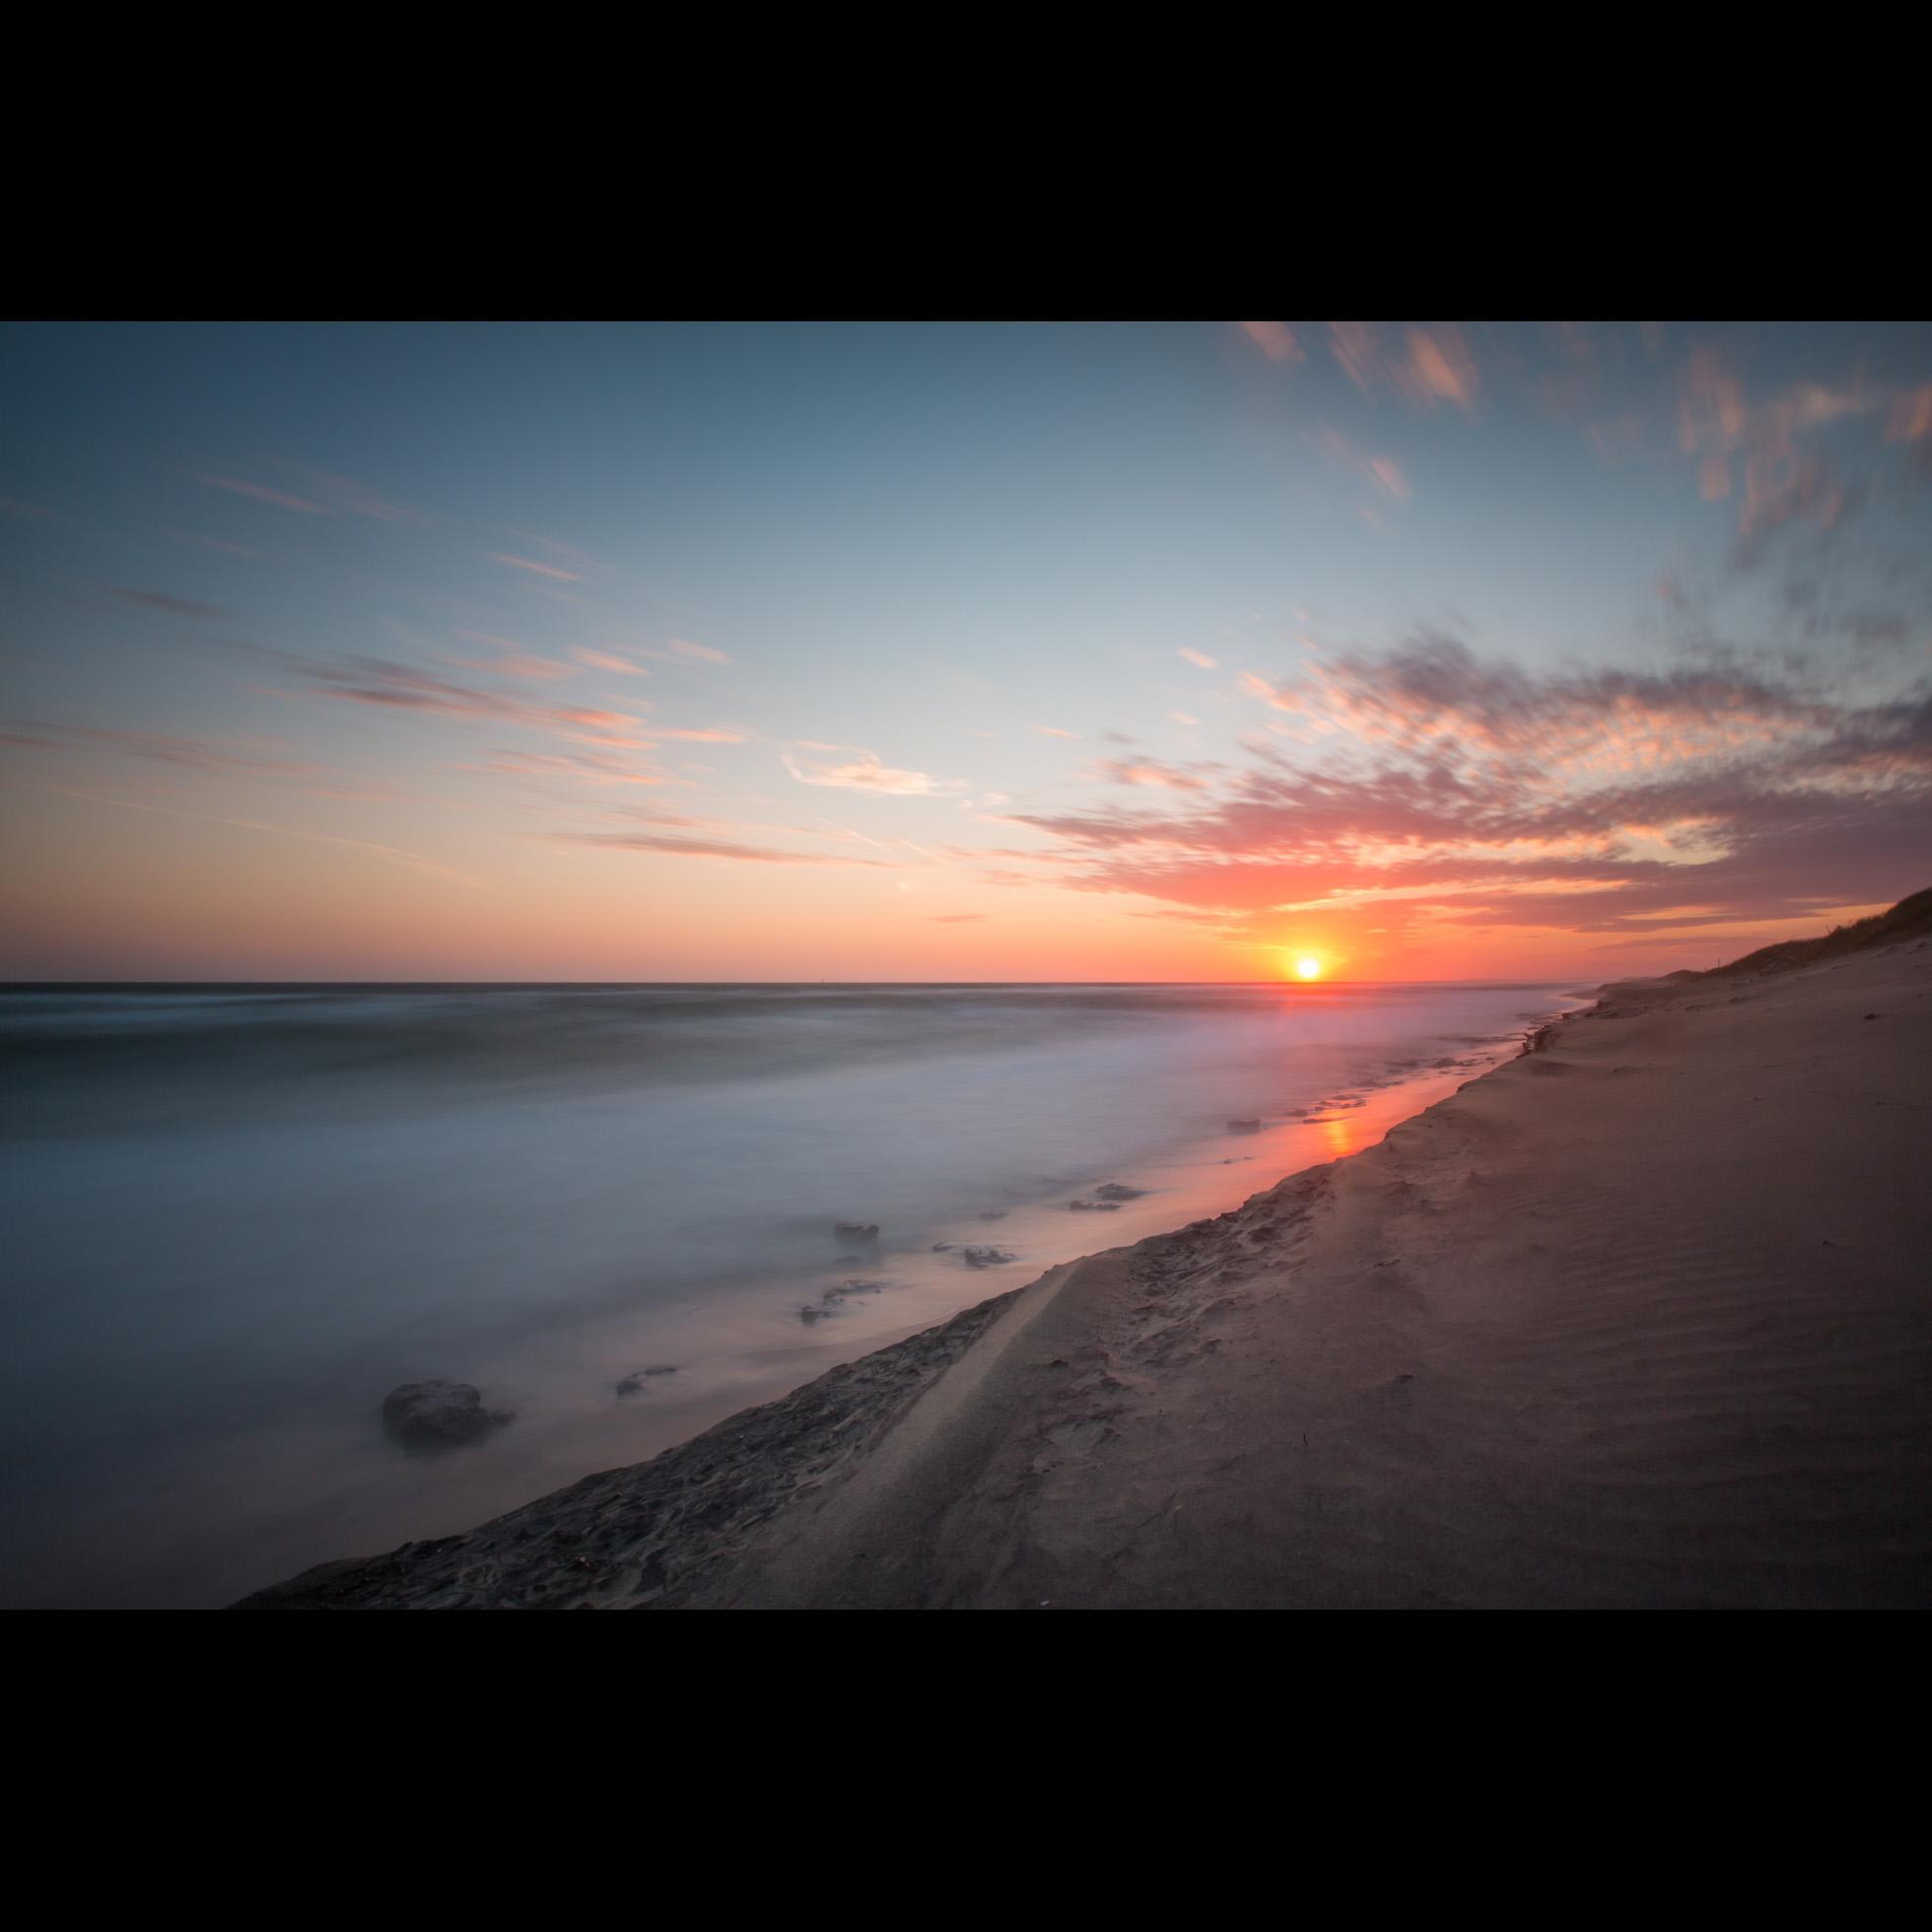 10.20 SOUTH BEACH STORM